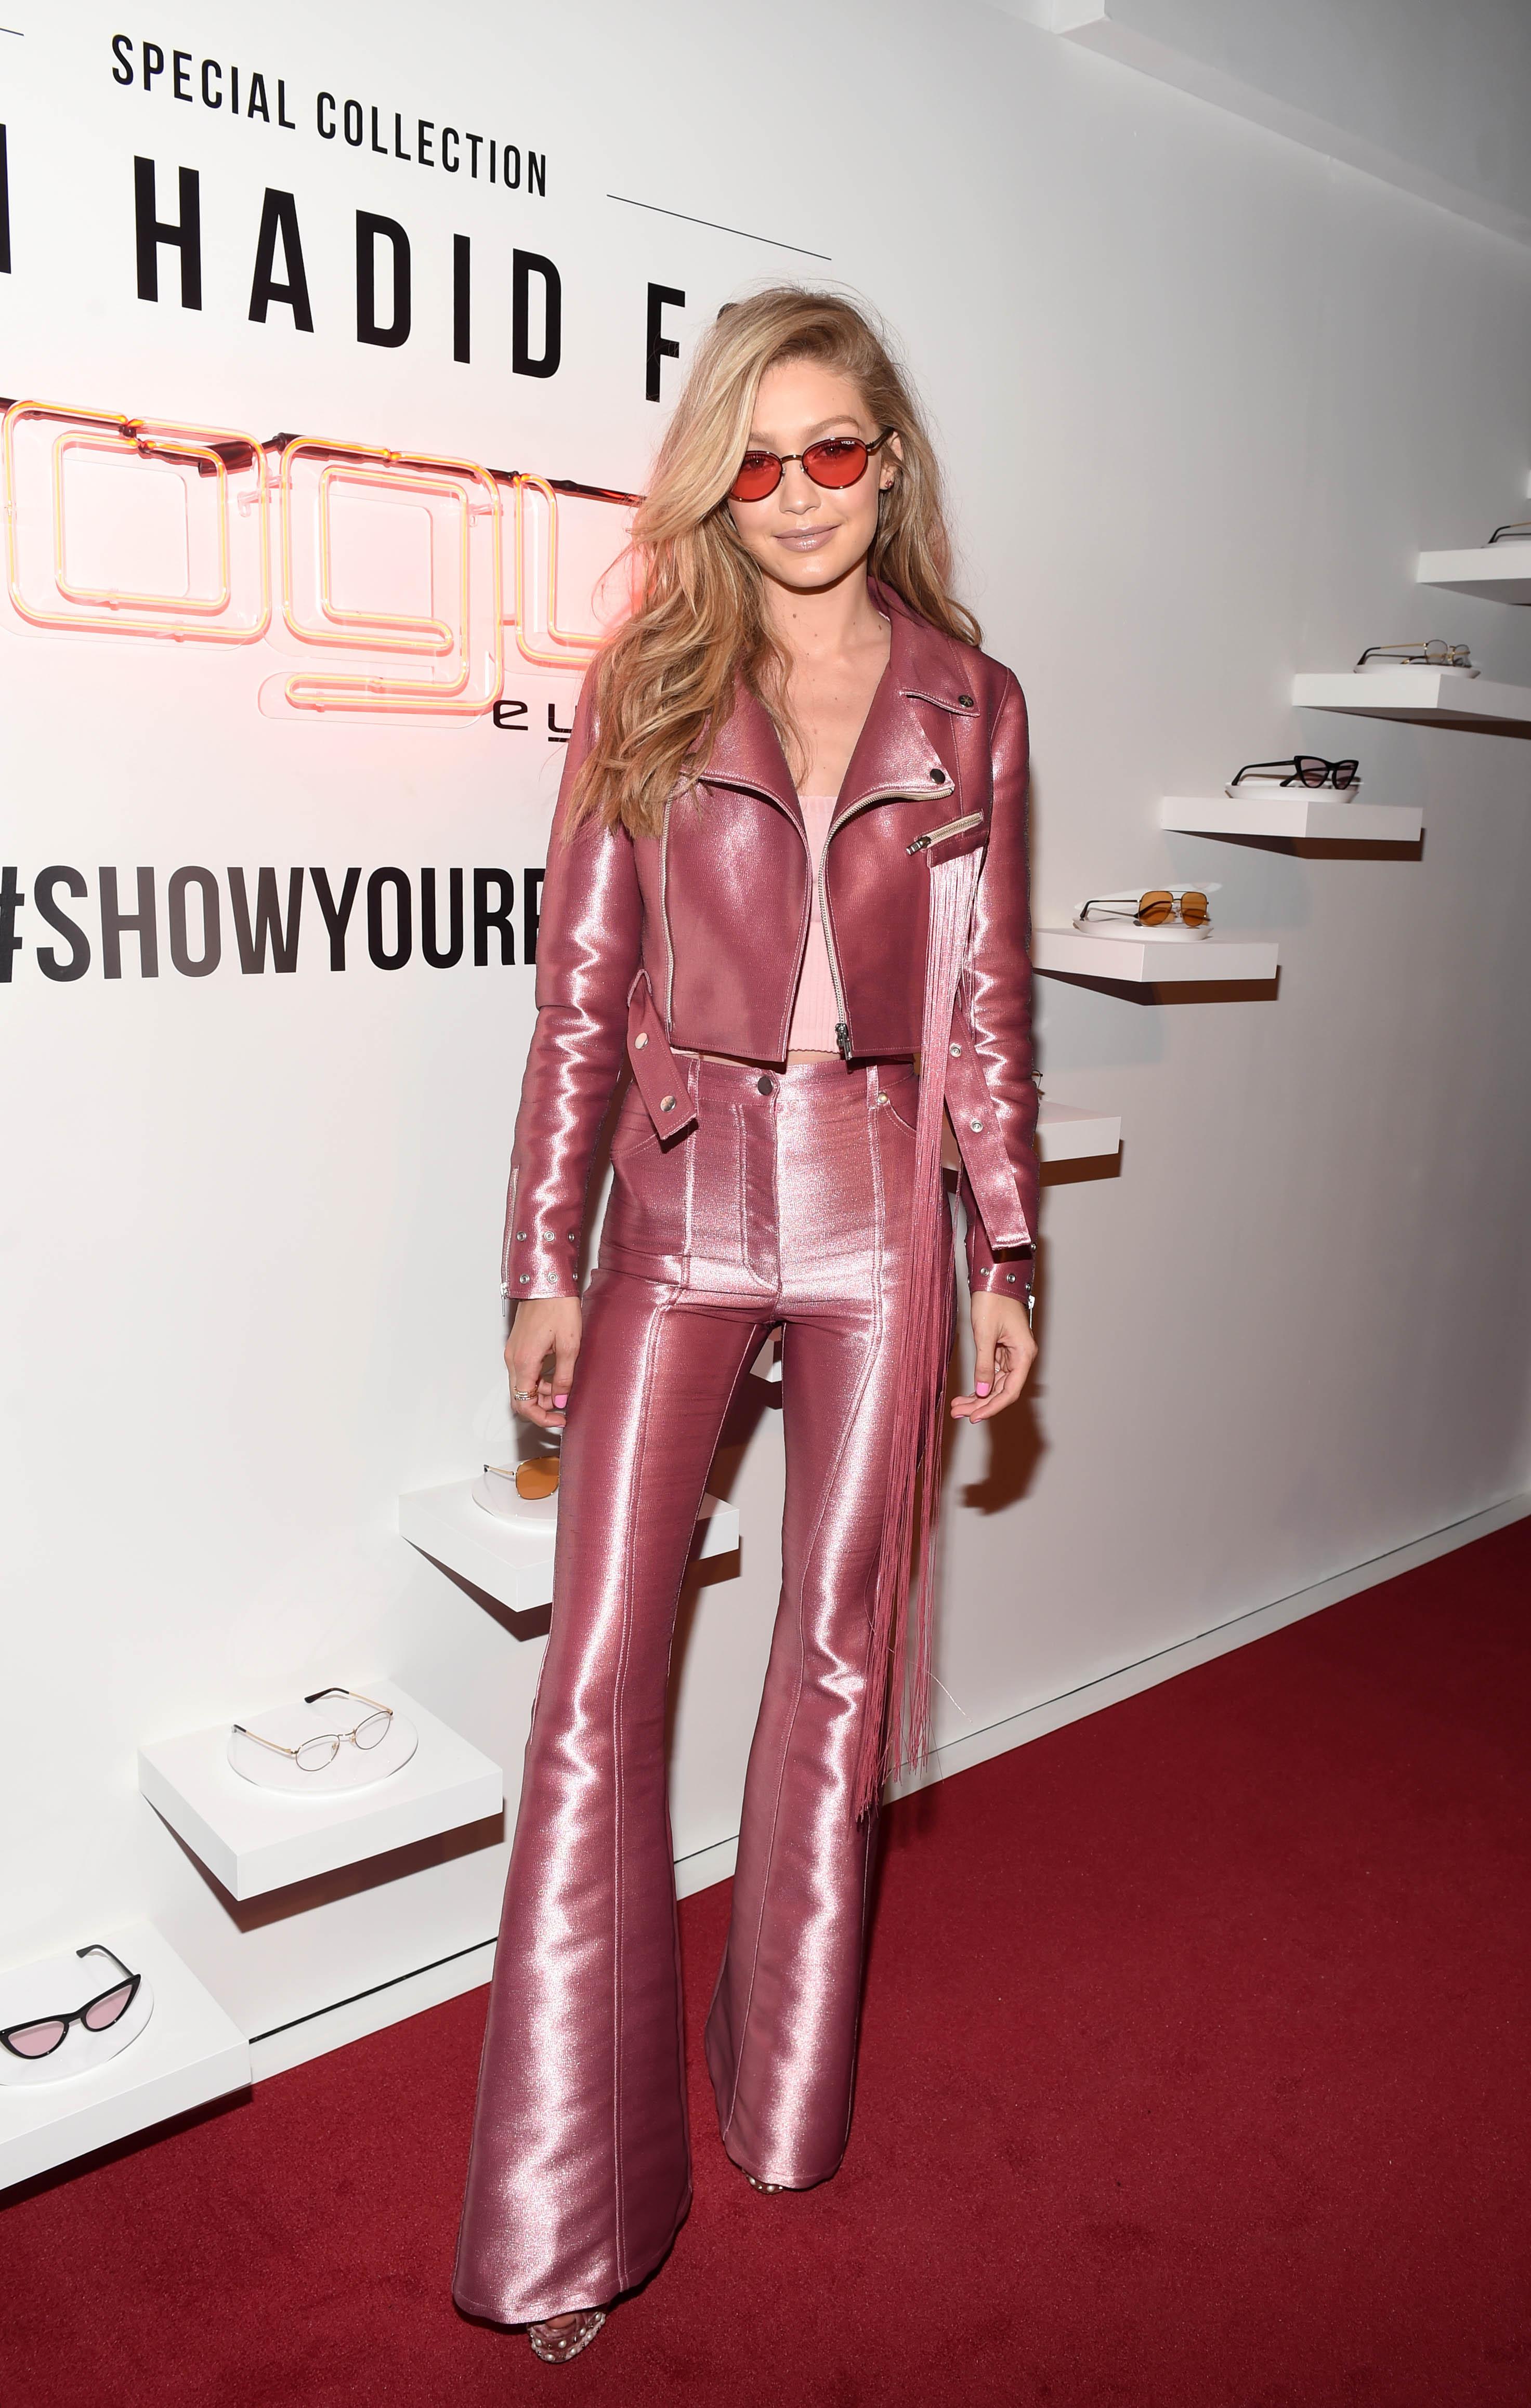 Gigi HadidGigi Hadid for Vogue Eyewear Collection Launch Party, Arrivals, New York, USA - 27 Jun 2017WEARING KREIST